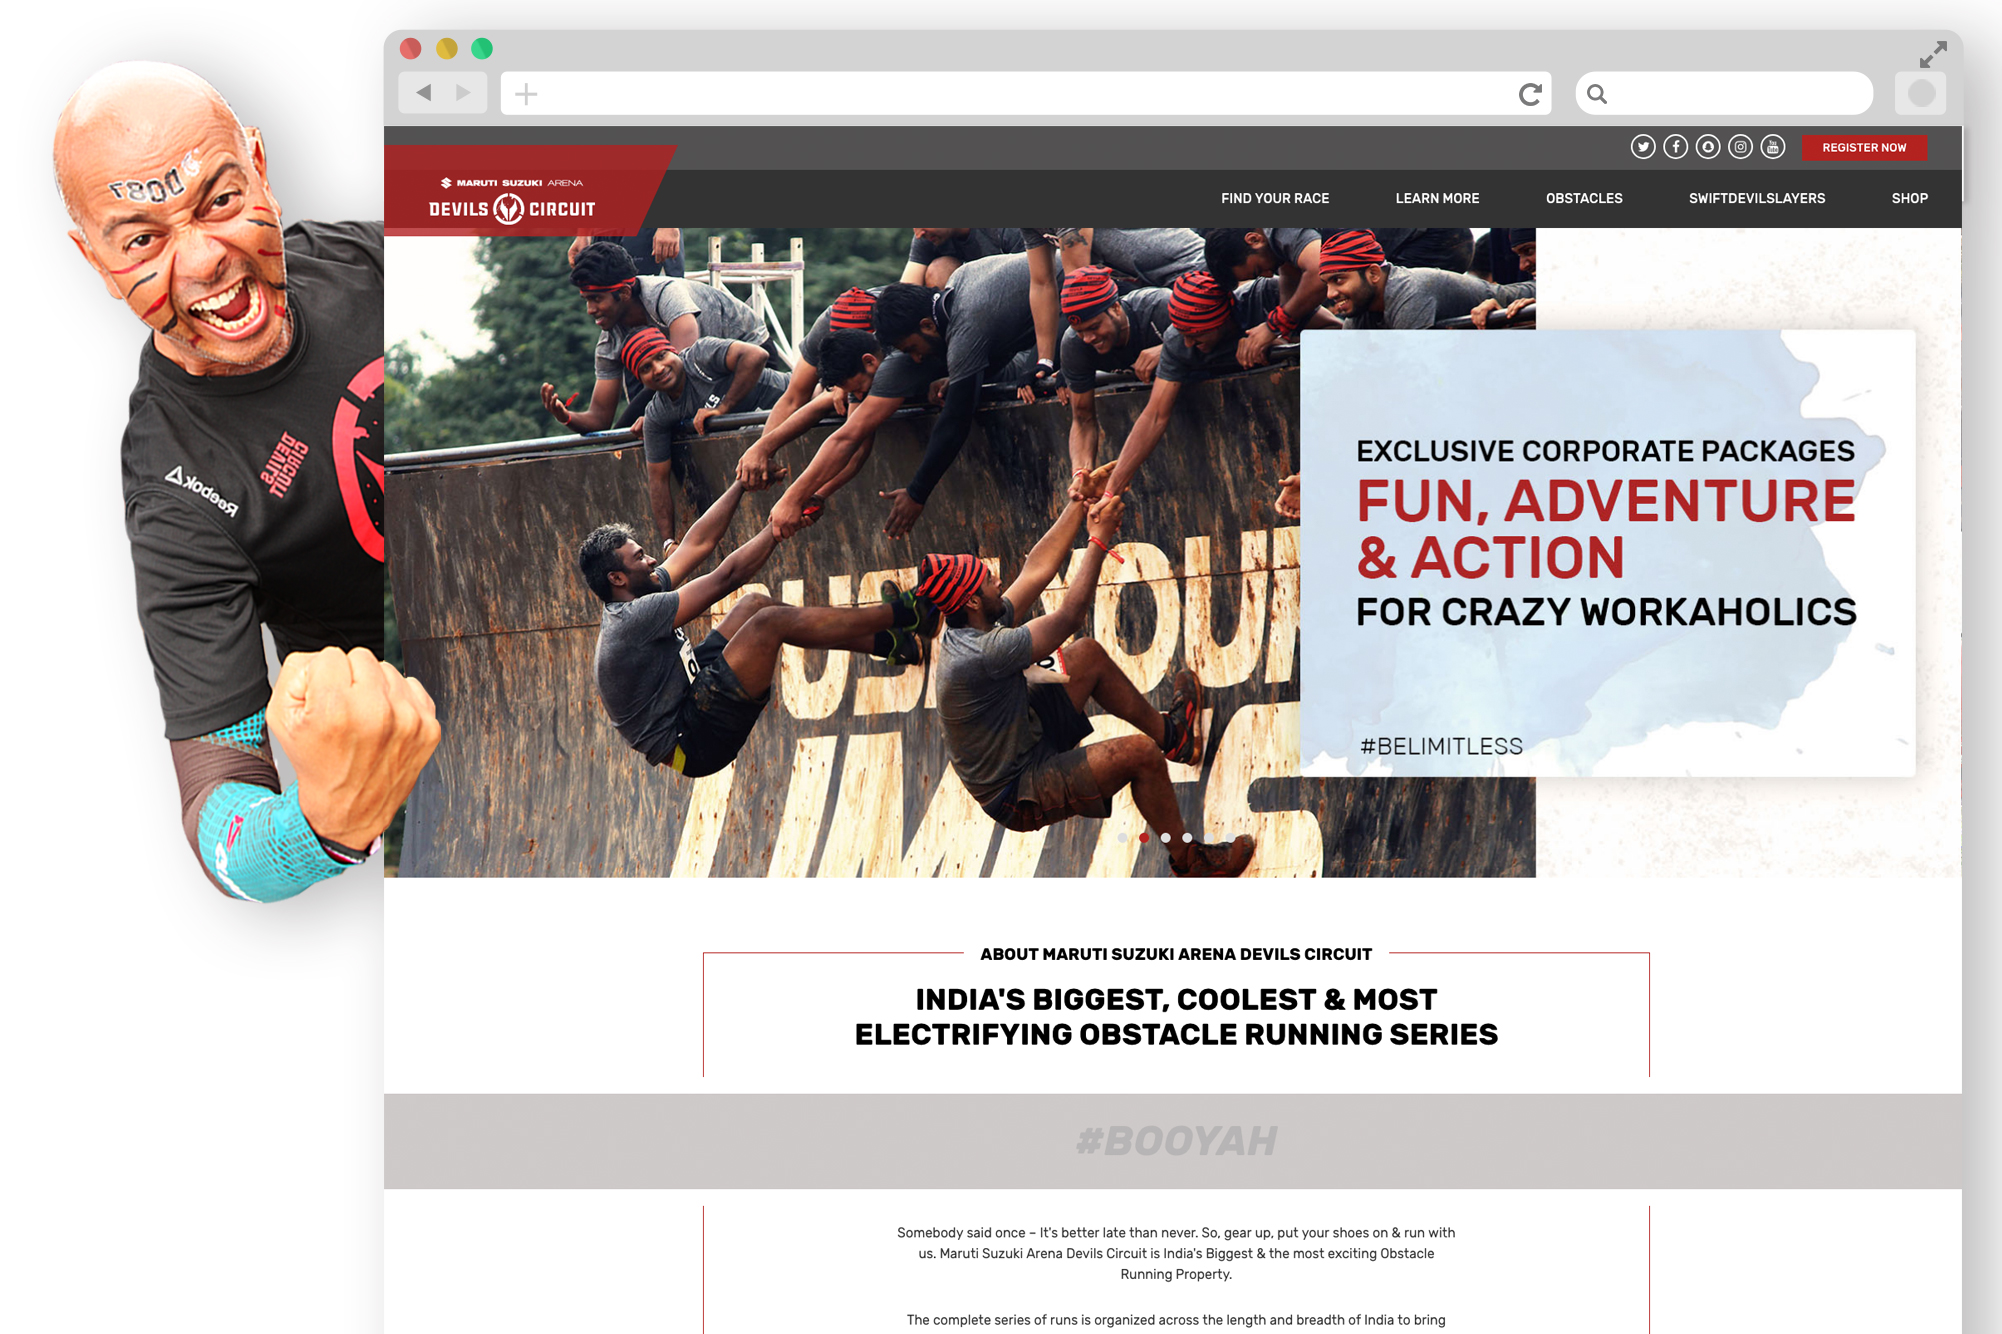 Online Tournaments For Crazy Workaholics